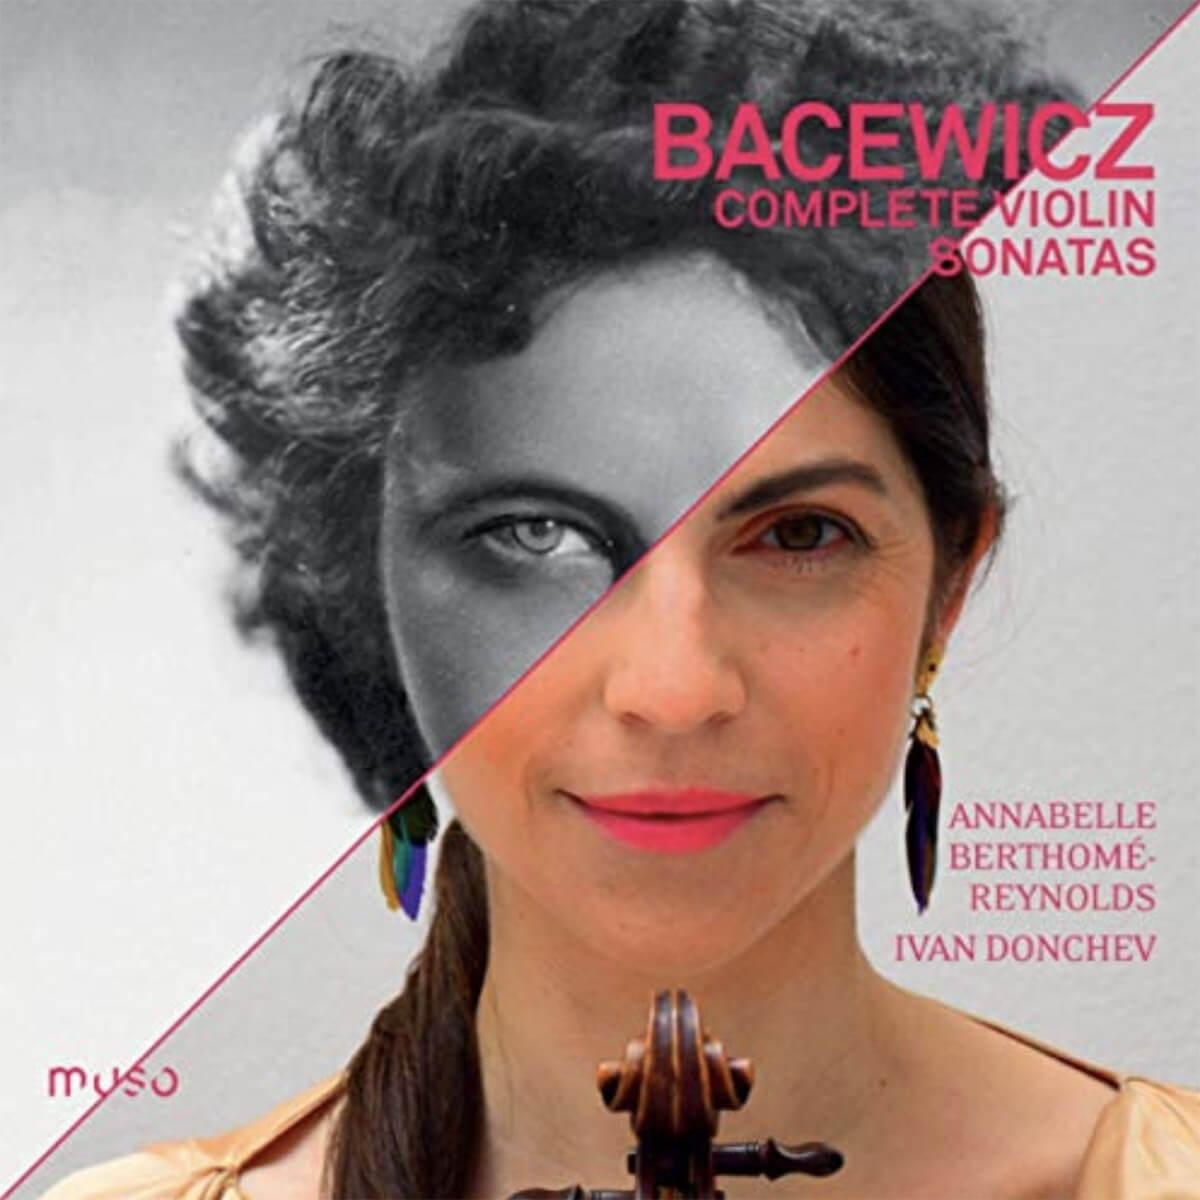 Grazyna Bacewicz - Complete Violin Sonatas